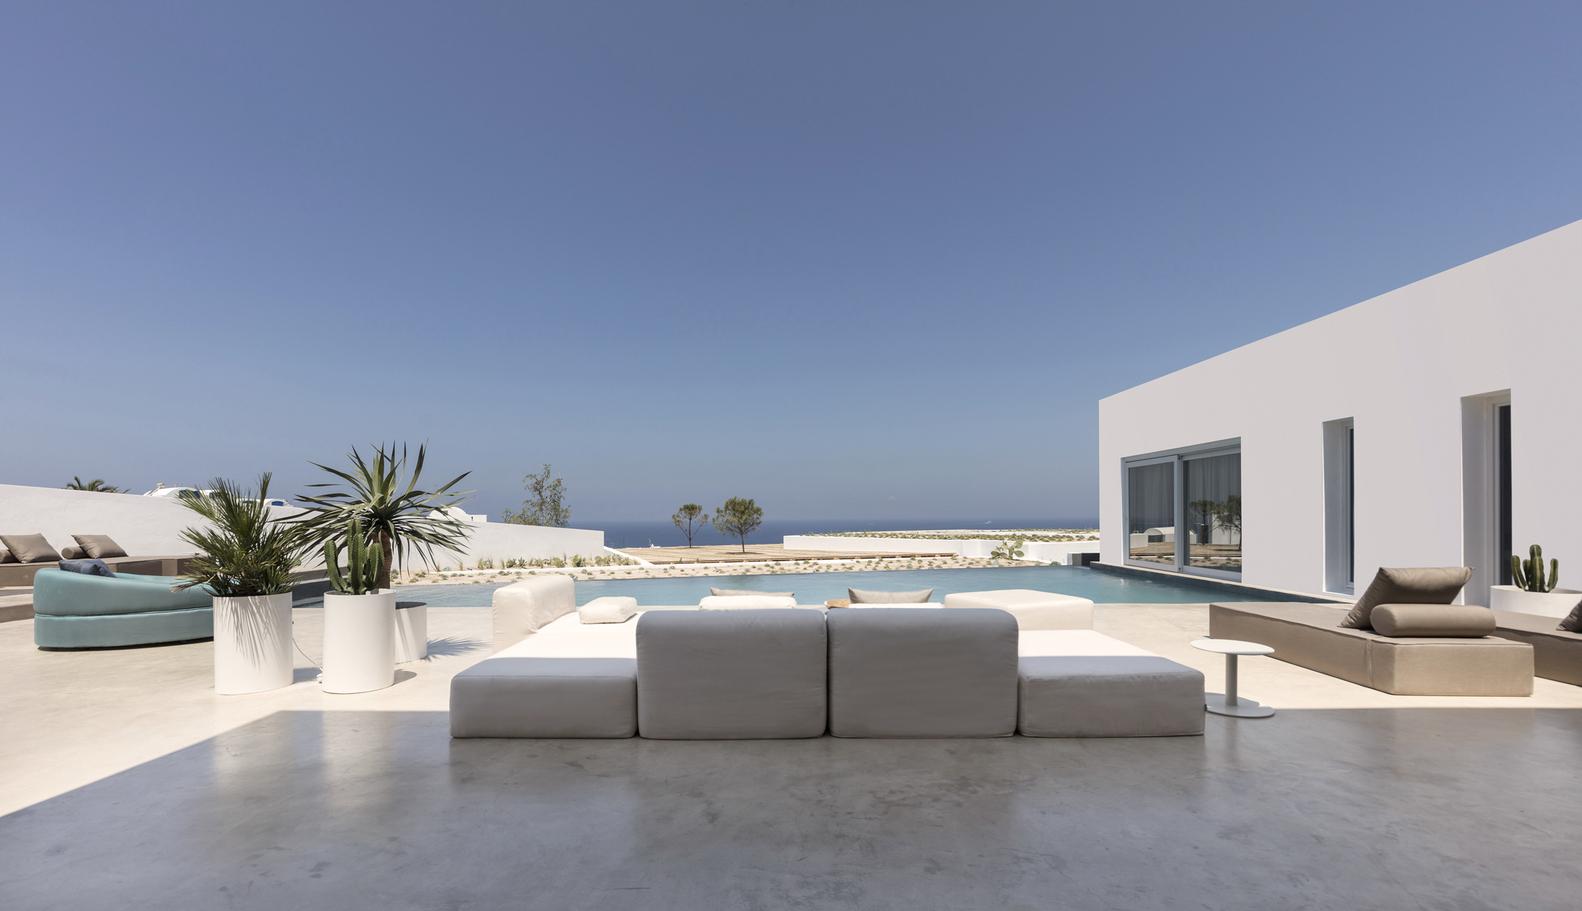 14_Summer Villa Arcadia Hotel_Kapsimalis Architects_Inspirationist